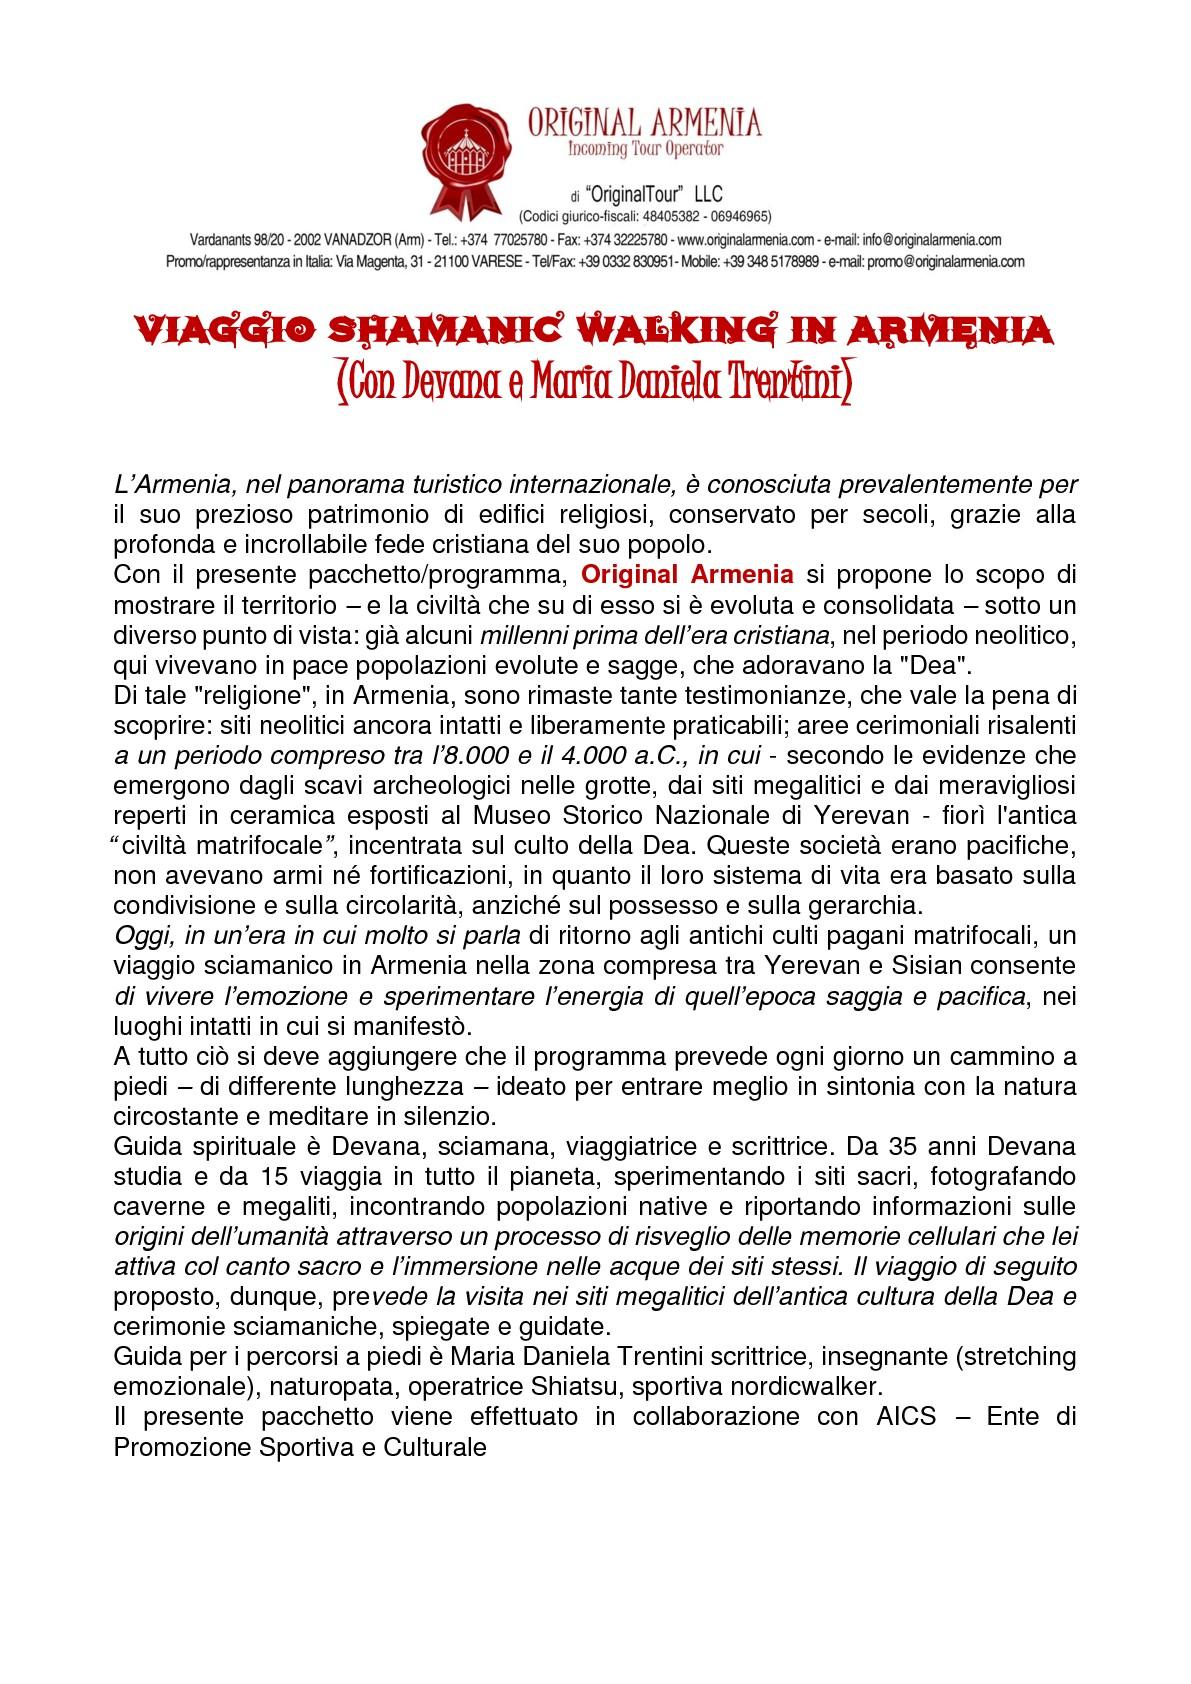 VIAGGIO SHAMANIC WALKING IN ARMENIA-001-001